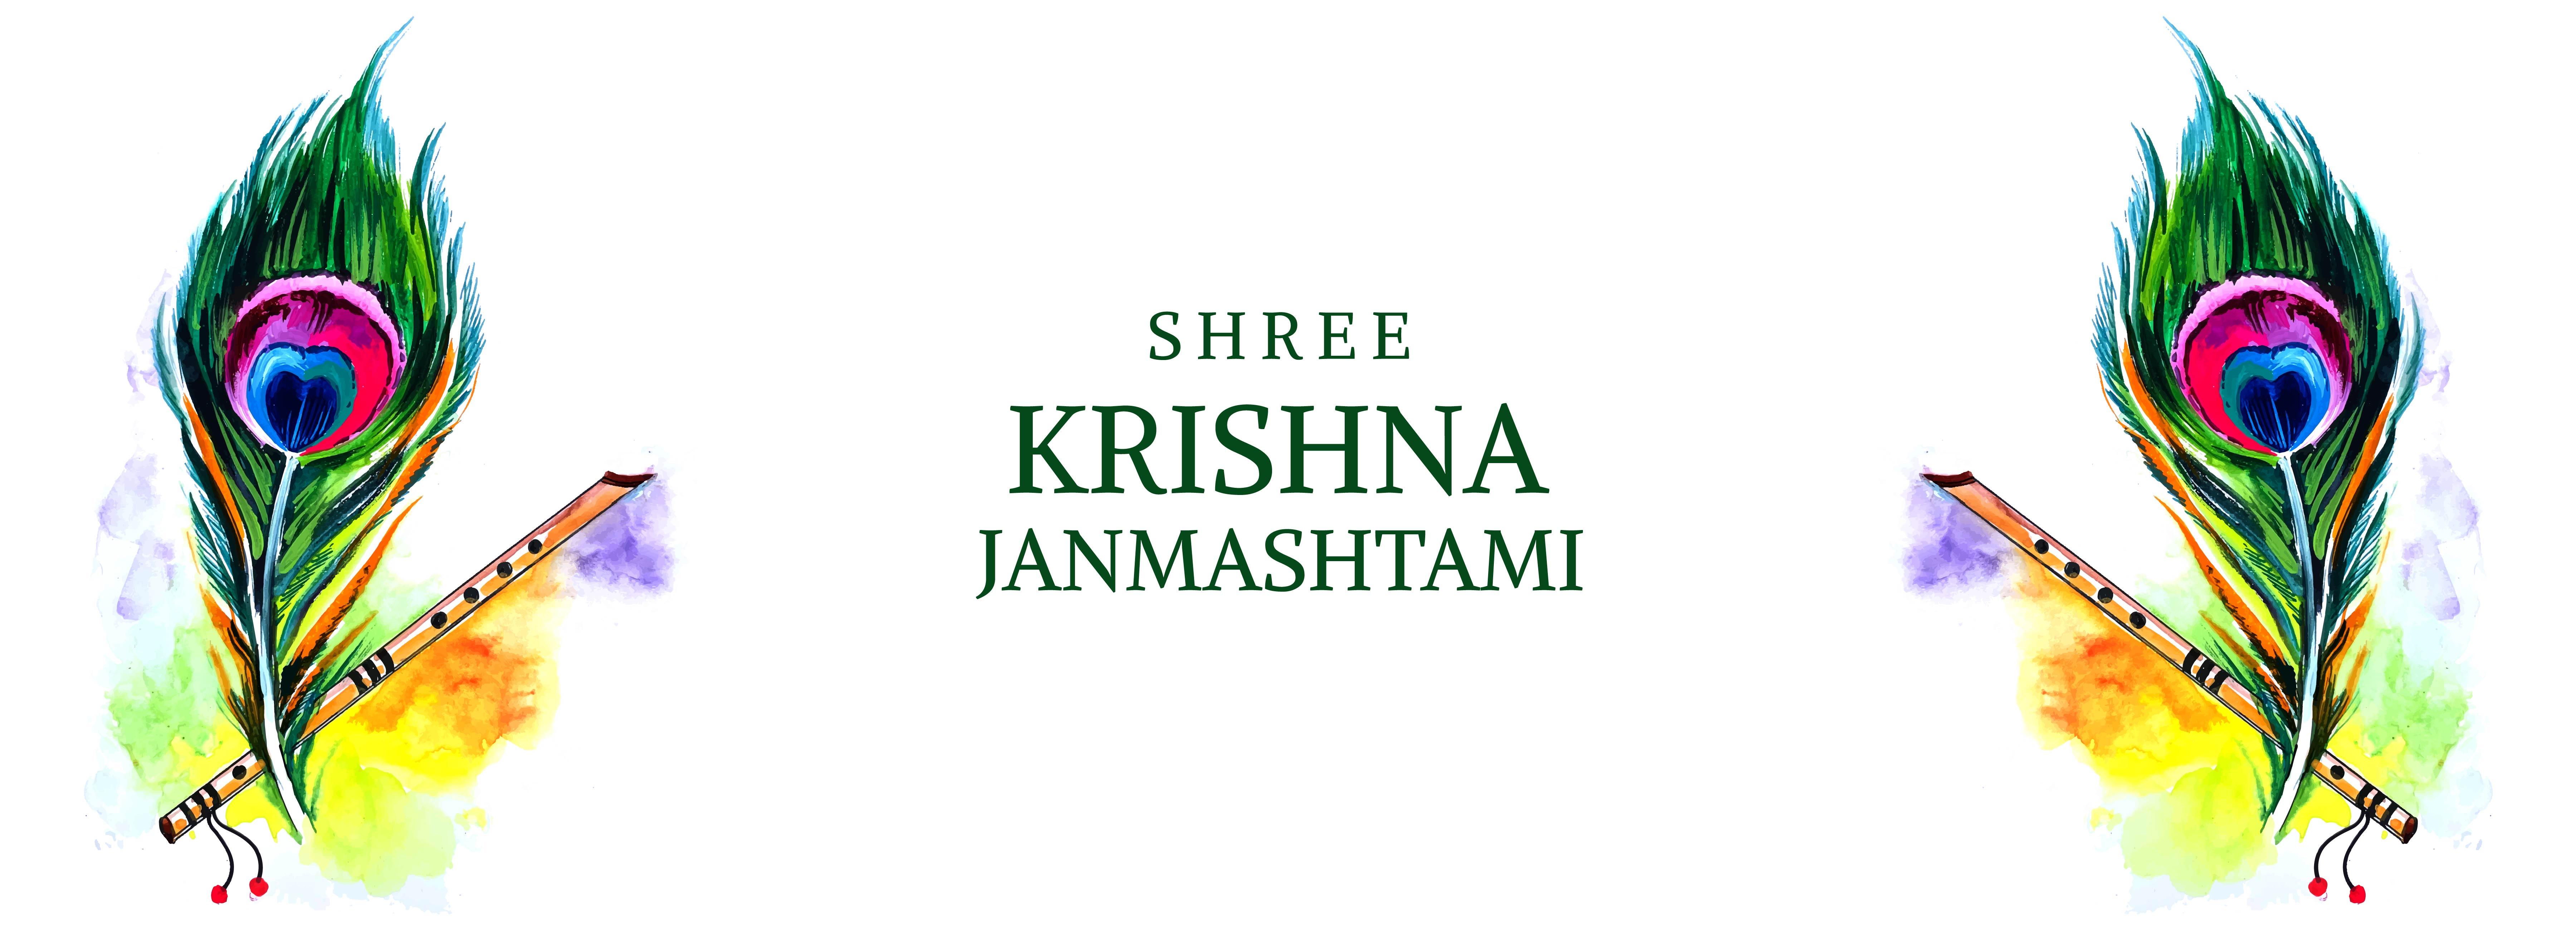 tarjeta de banner de shree krishna janmashtami